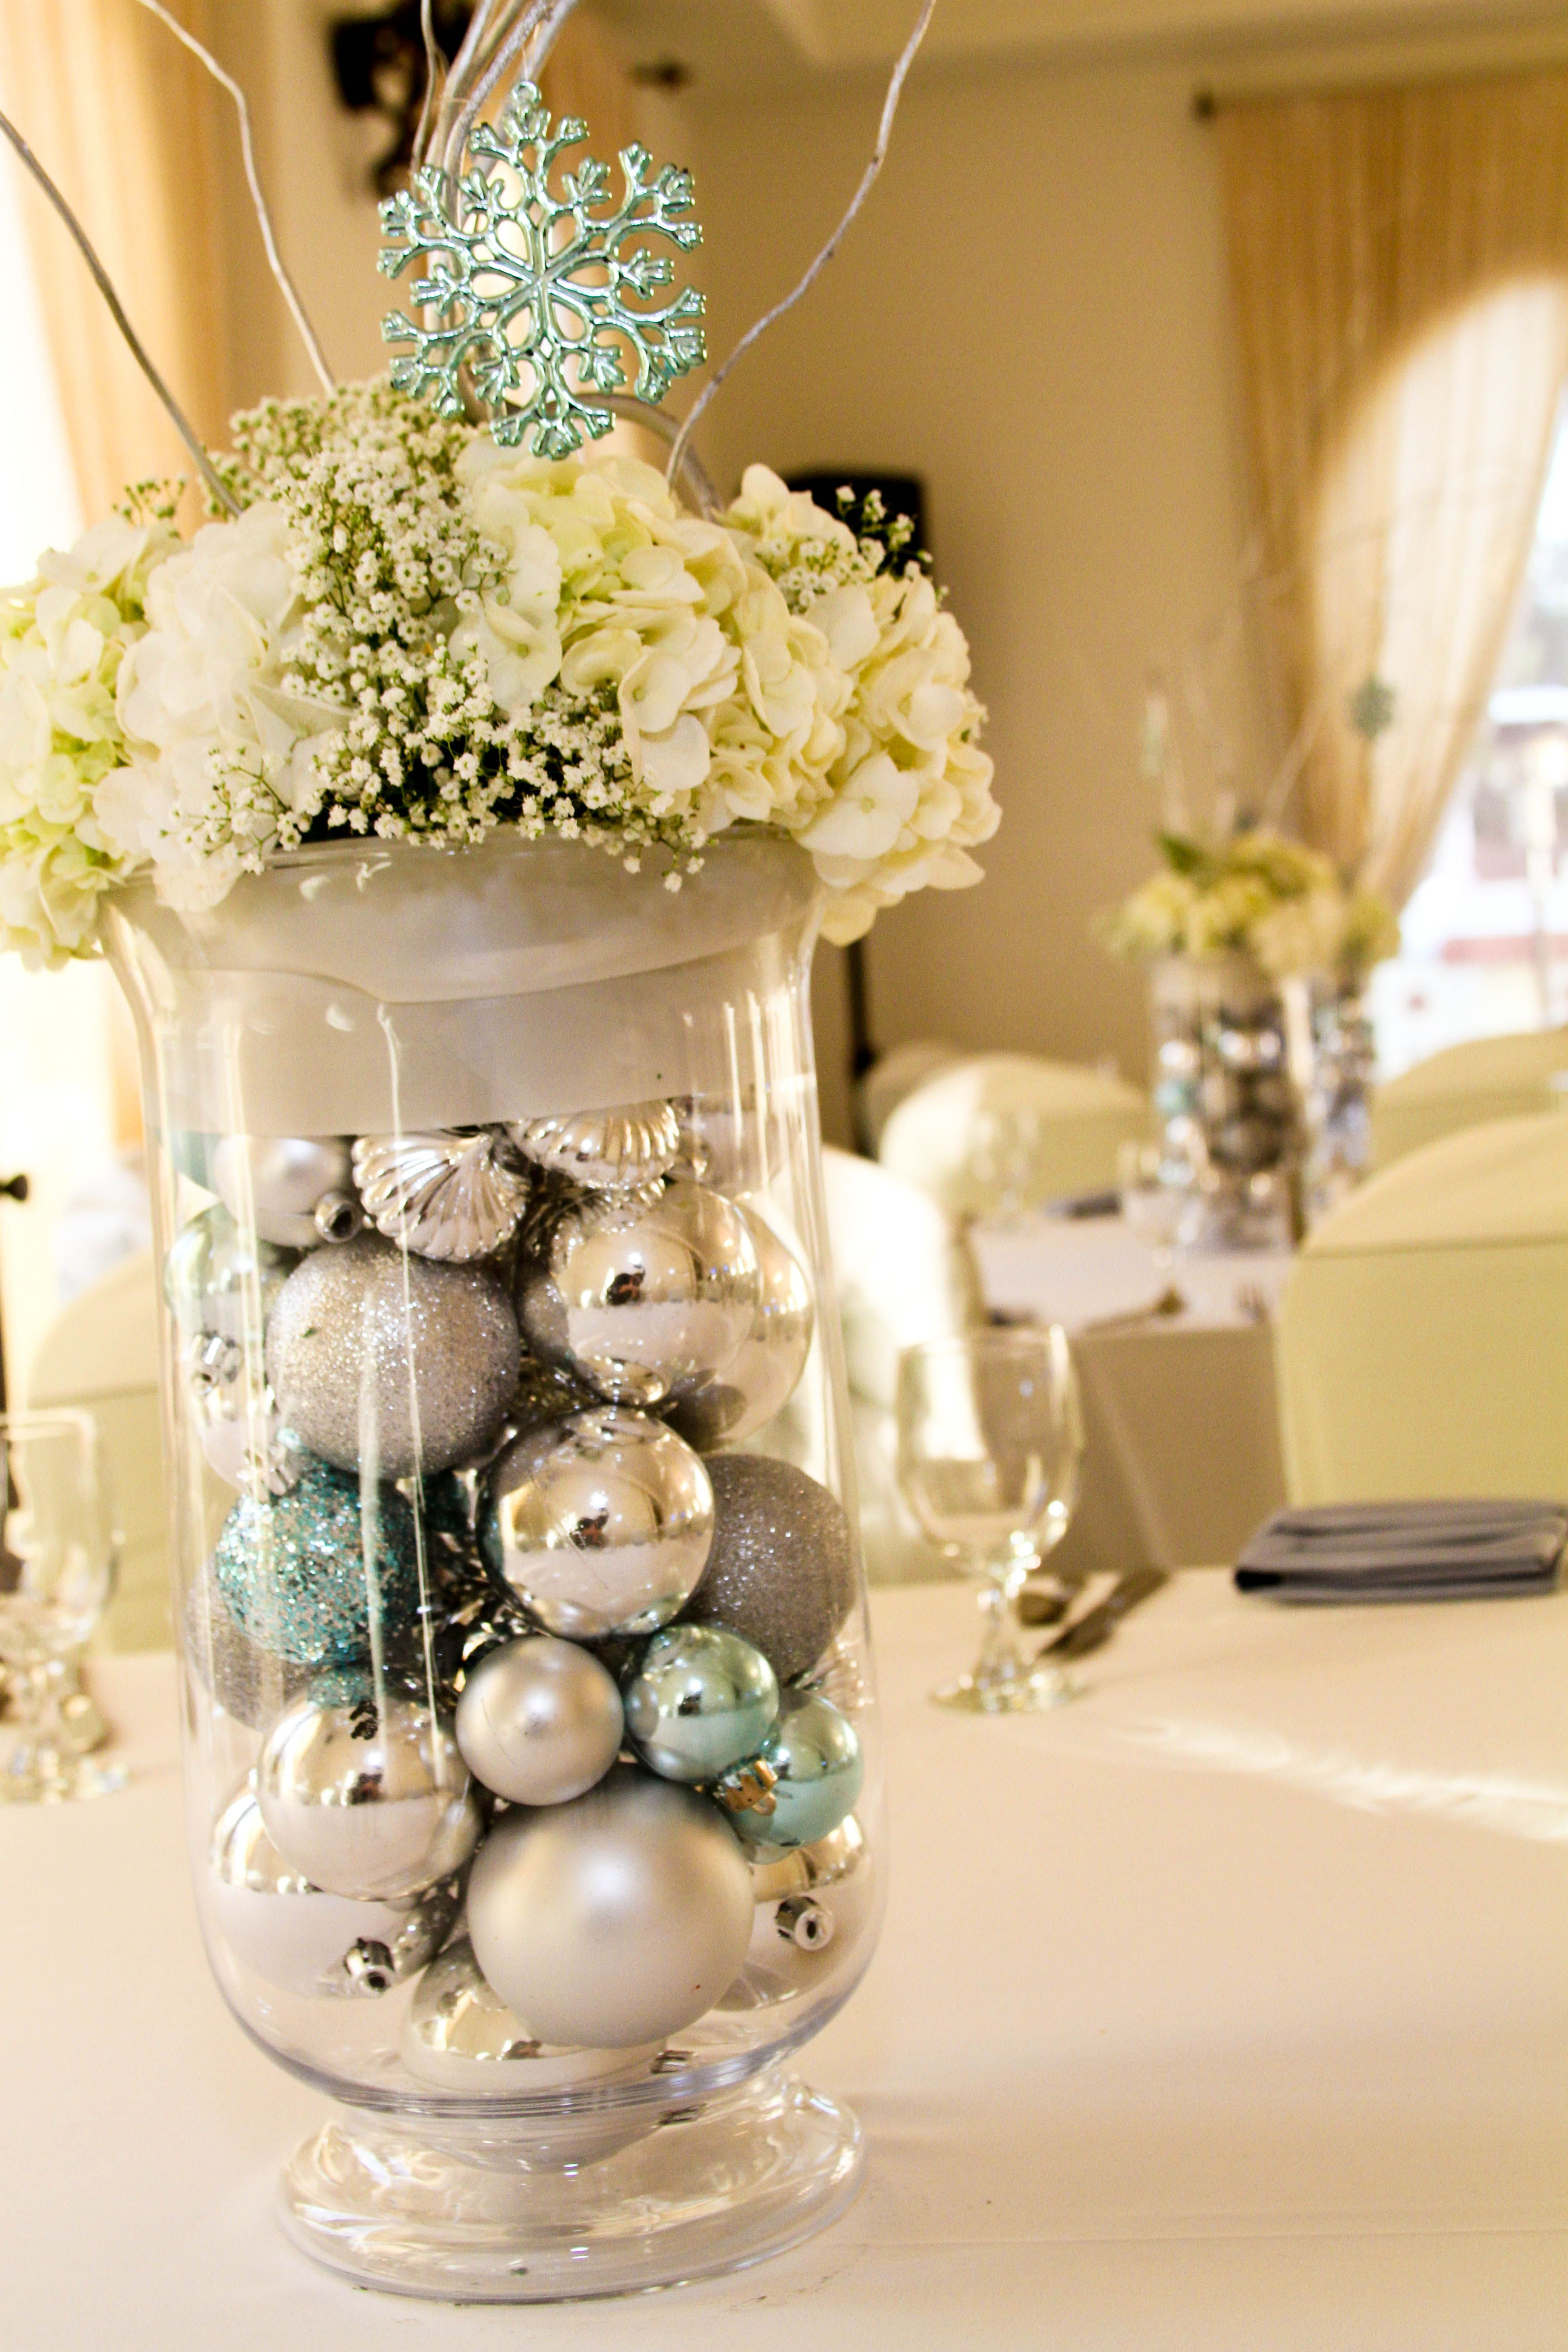 Beautiful Winter Themed Centerpiece Winter Wonderland Wedding Decorations Wedding Themes Winter Wedding Decorations Centerpieces